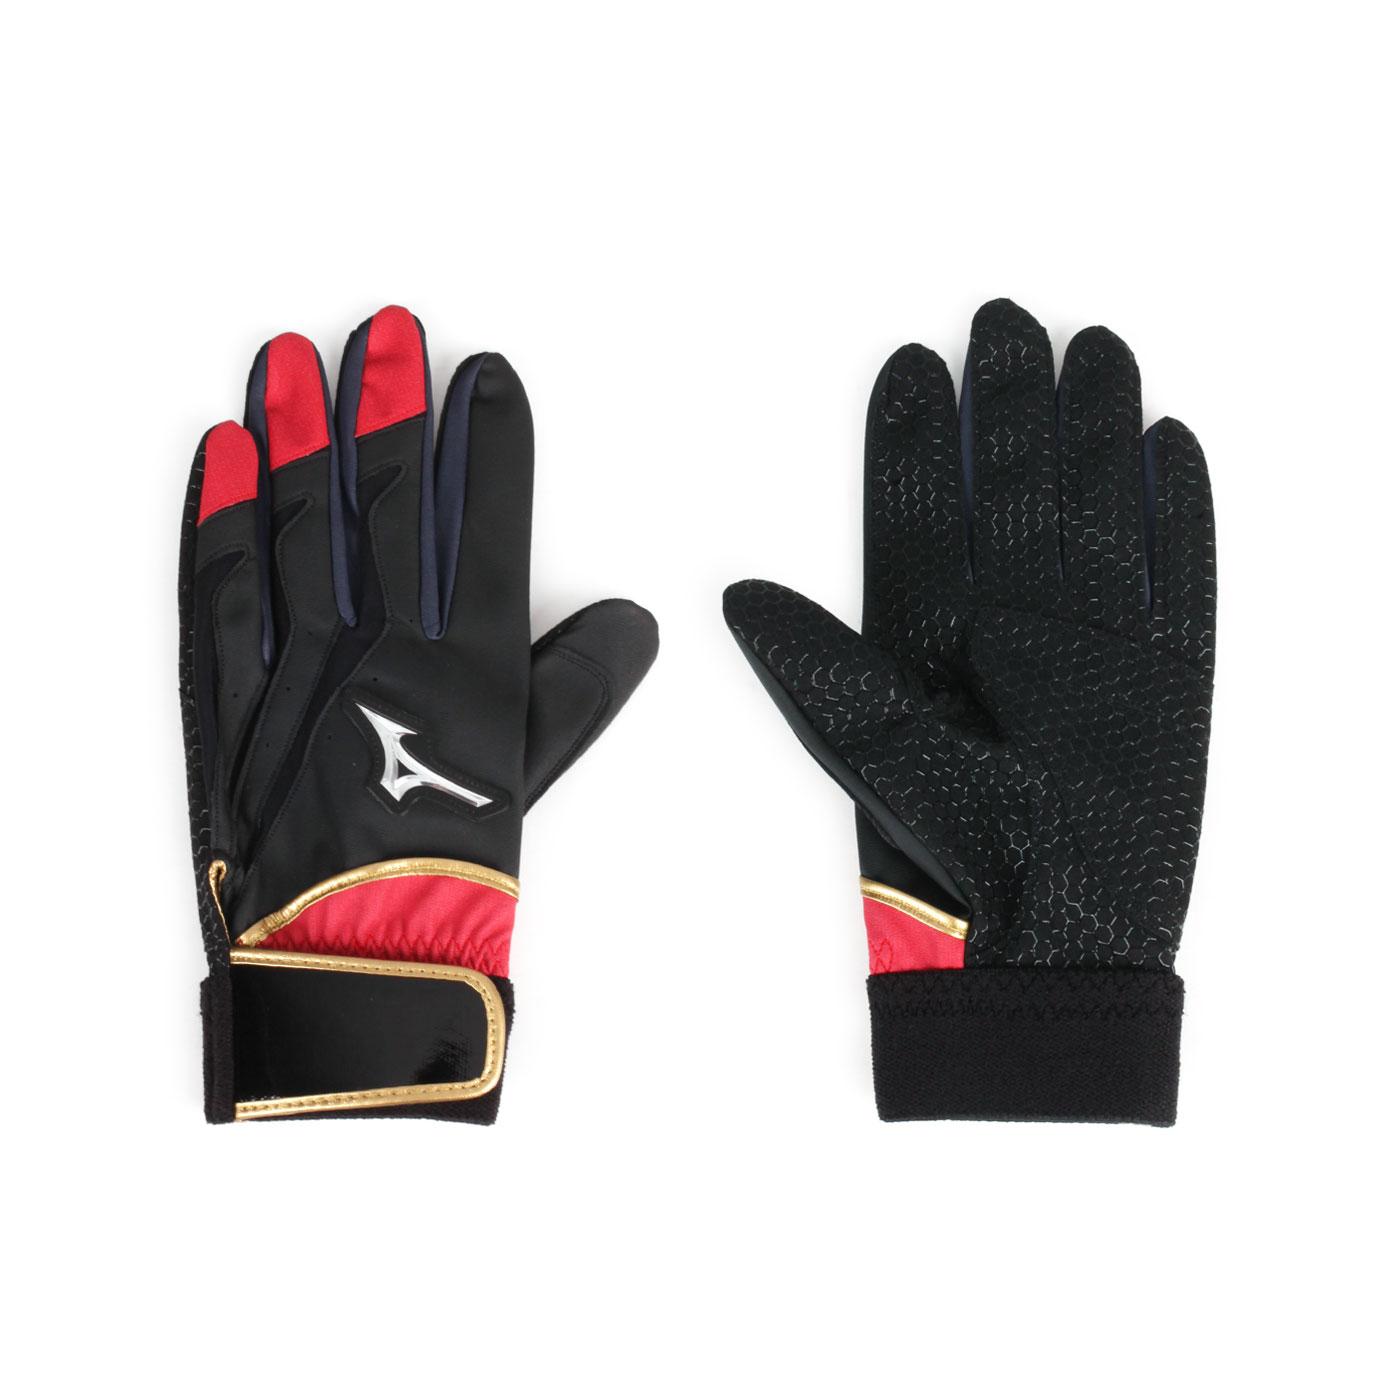 MIZUNO 打擊手套(右打者用) 1ETEA01062 - 黑紅金銀